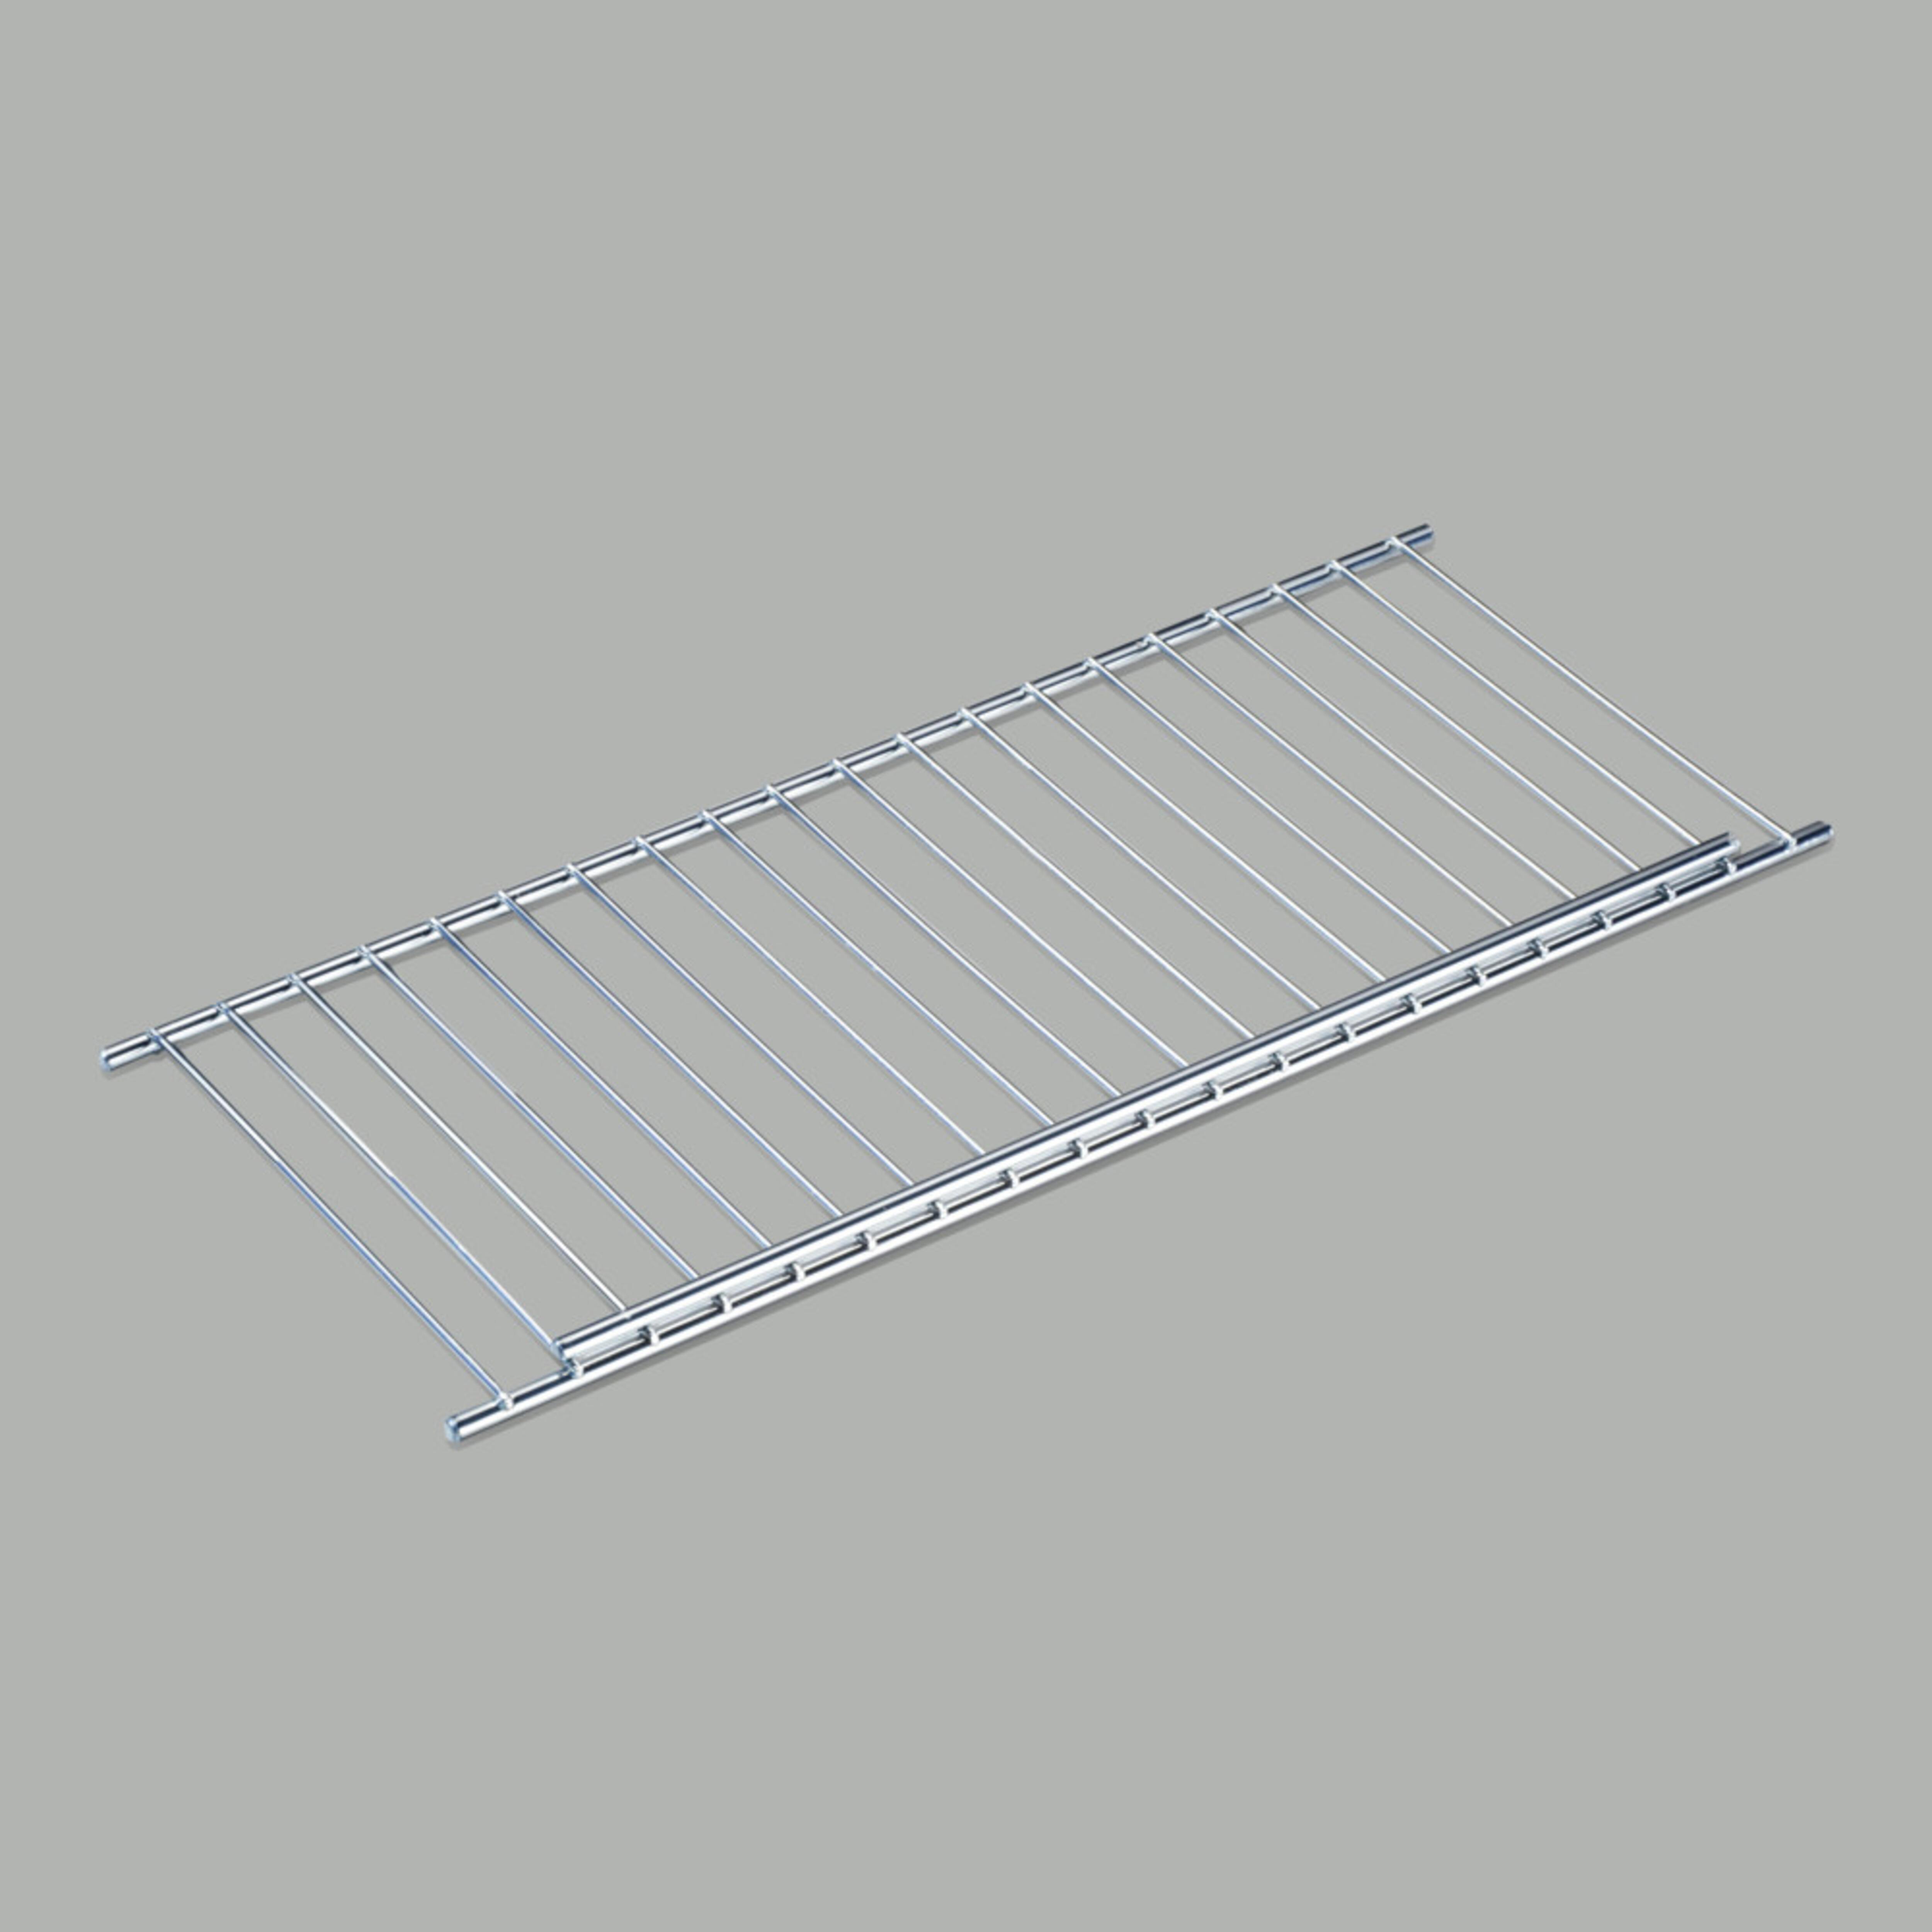 Dometic RM855x-SHLF